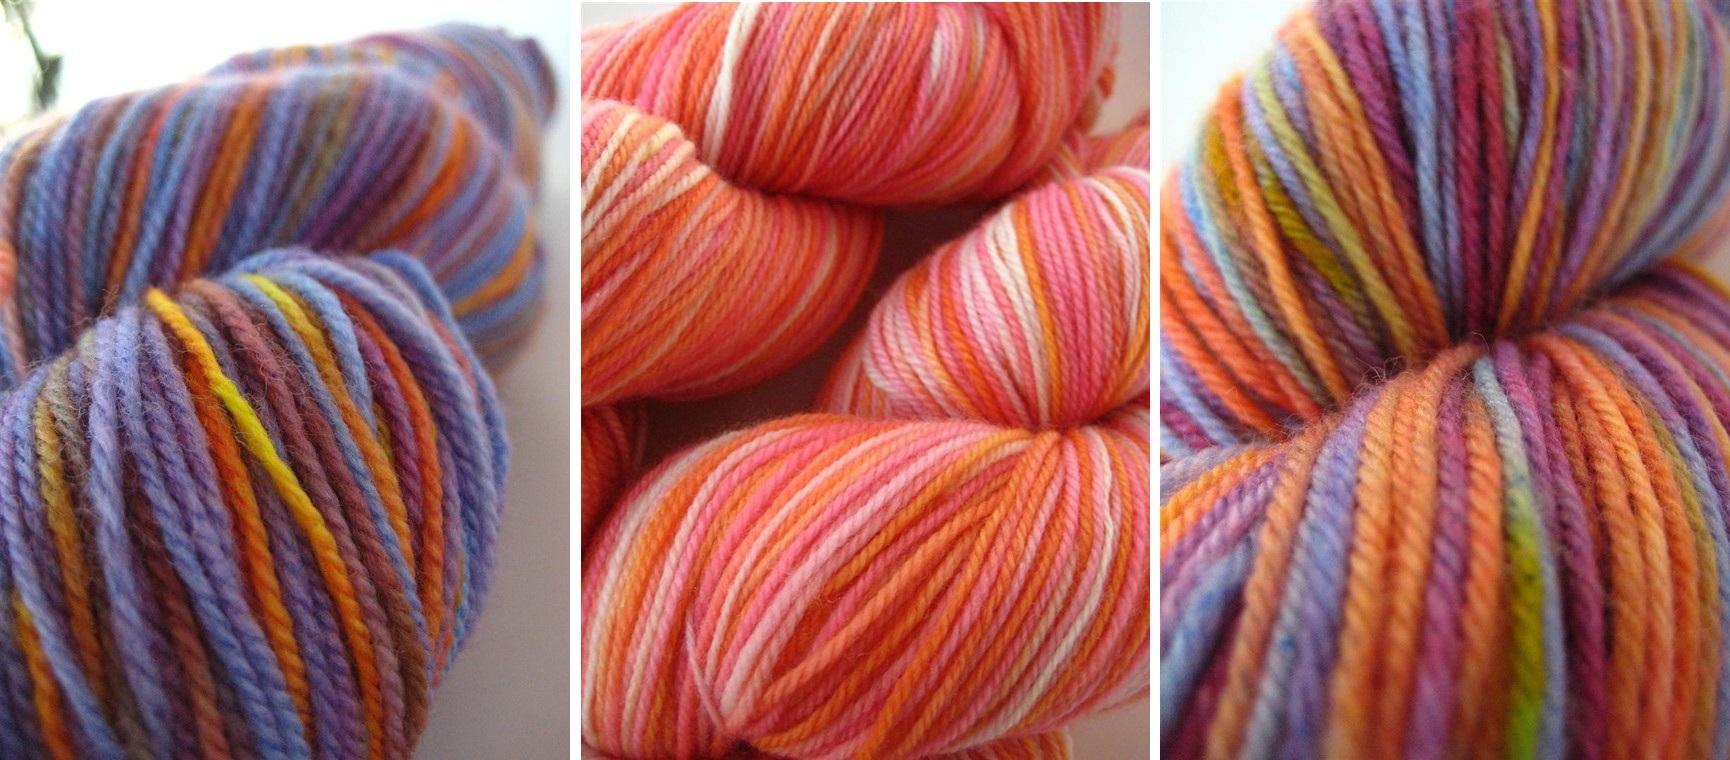 yarn, sock yarn, knitting, crochet, hand-dyed, handdyed